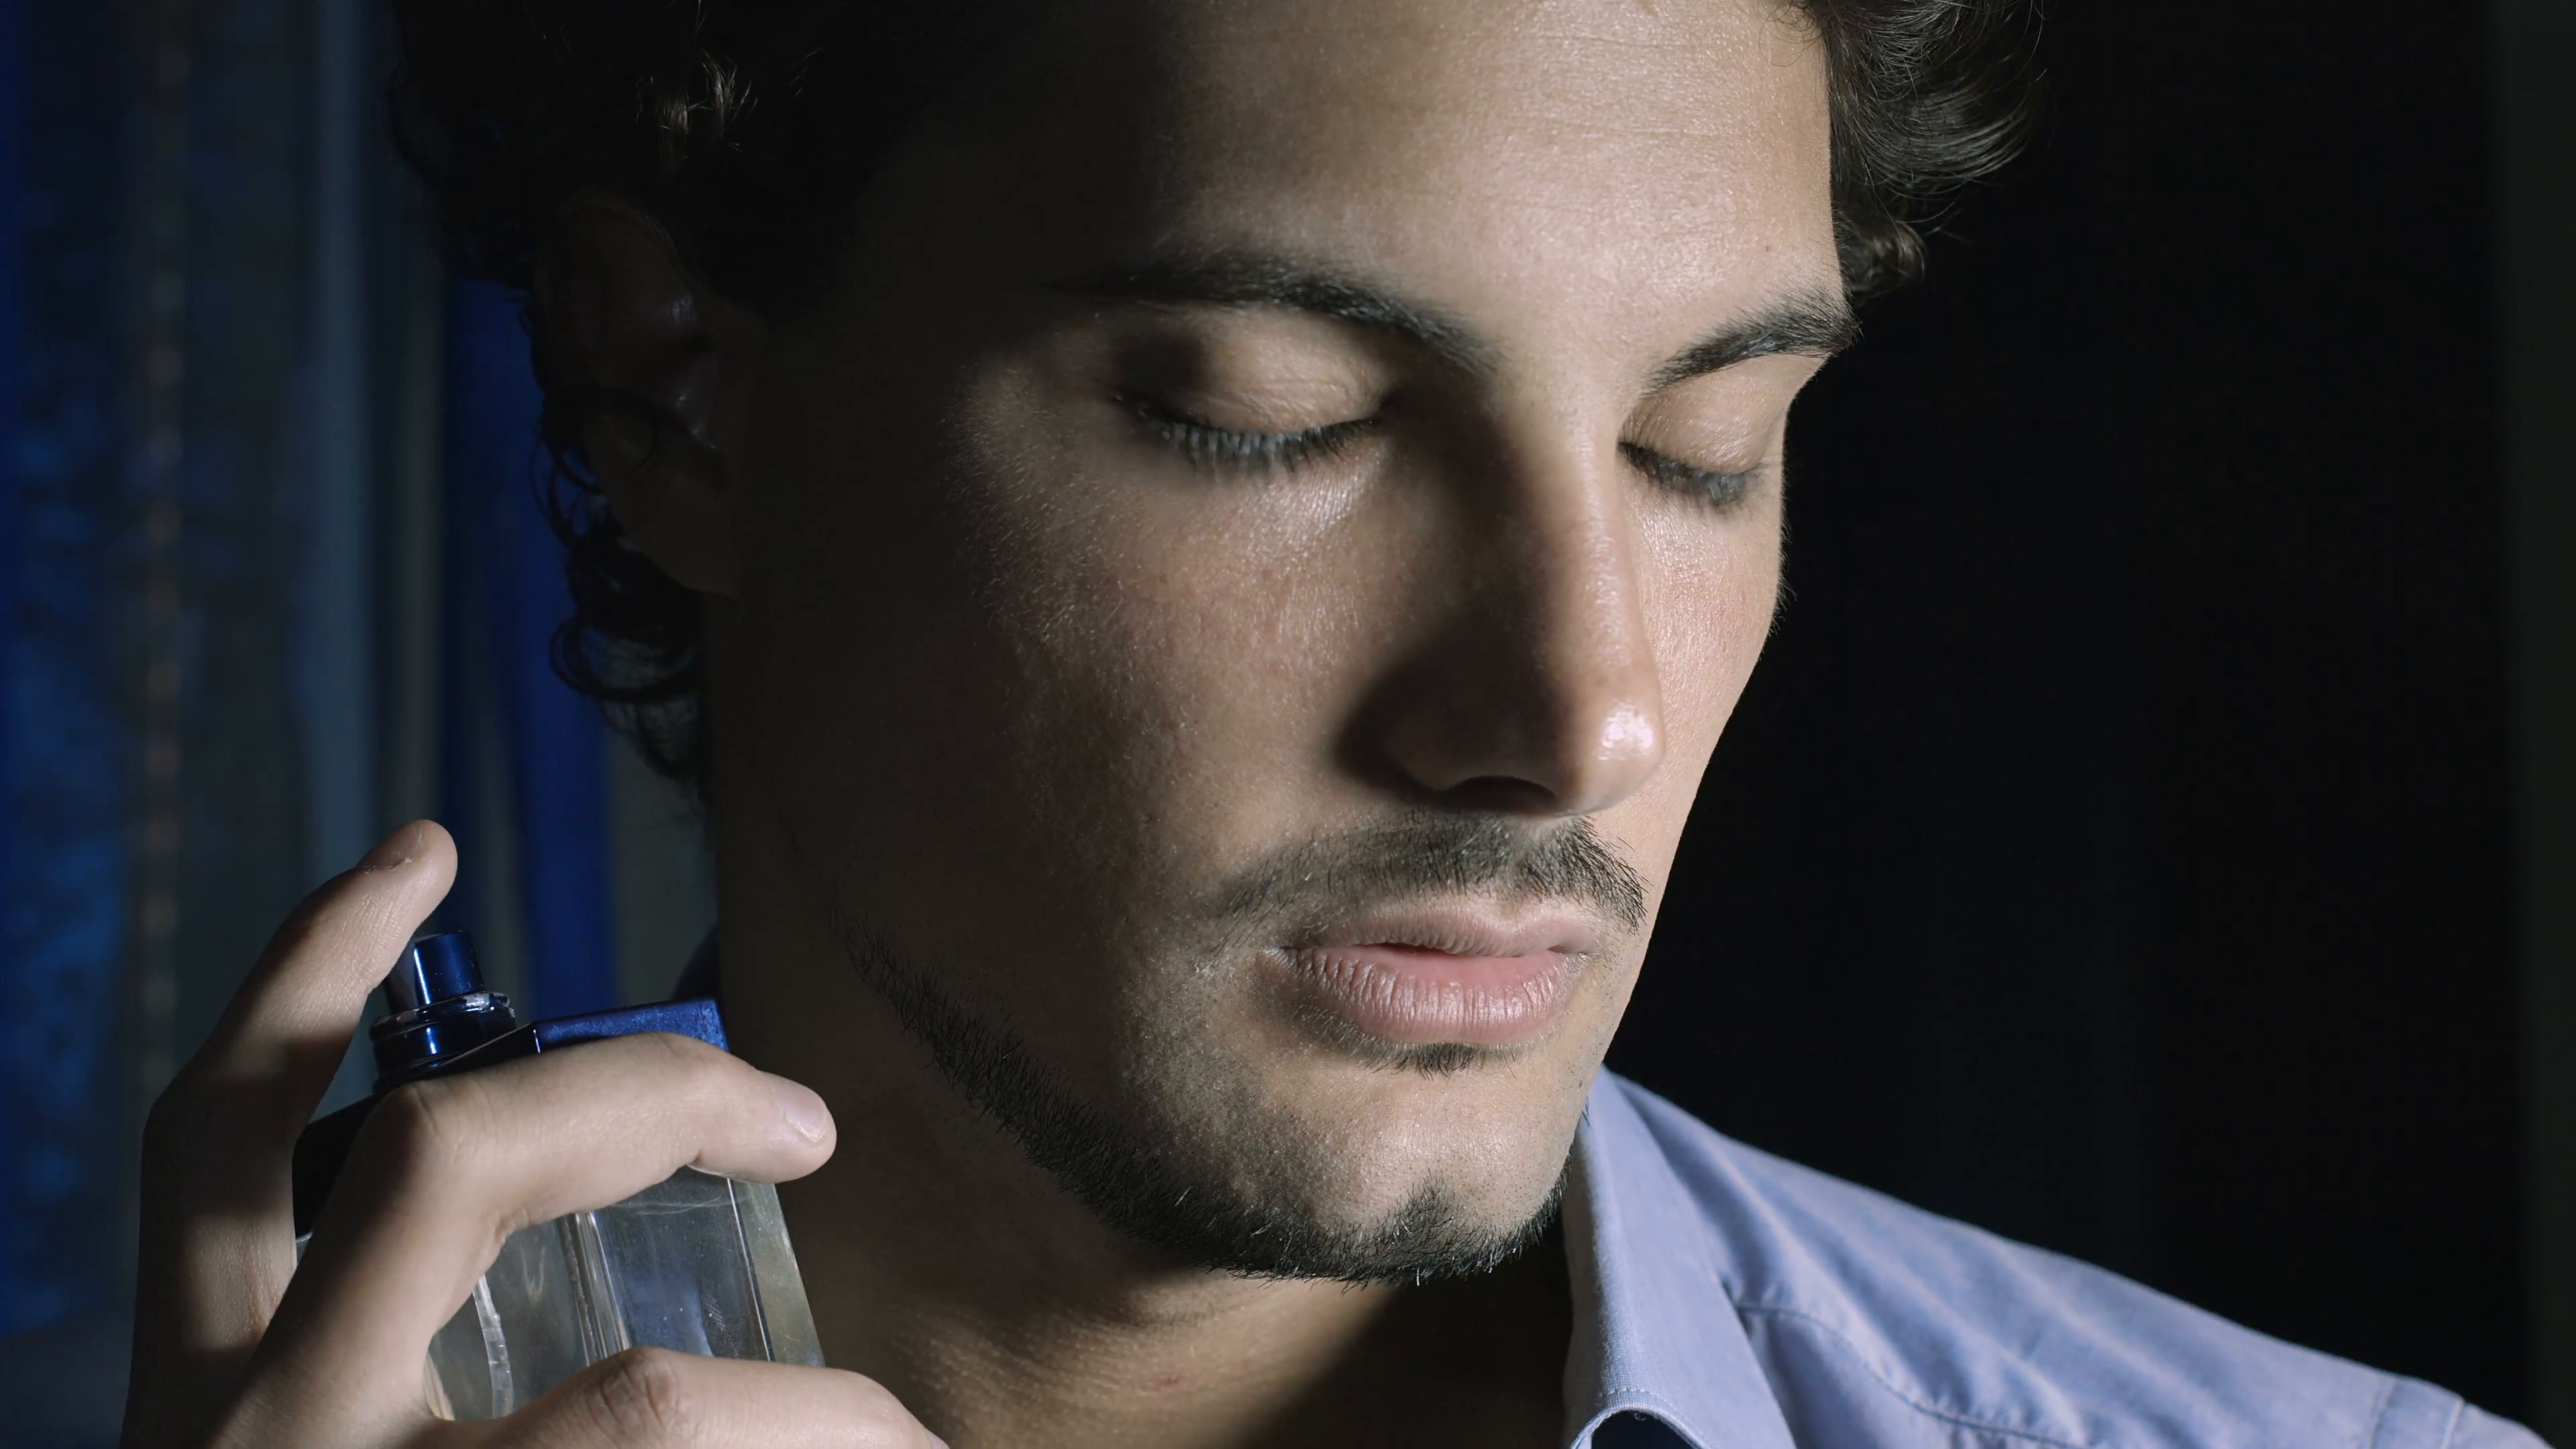 gorgeous young man spraying perfume to itself 4zmsiqcfue  F0000 - فواید استفاده از عطر برای مردان؛ شخصیت شما چه بویی میدهد؟